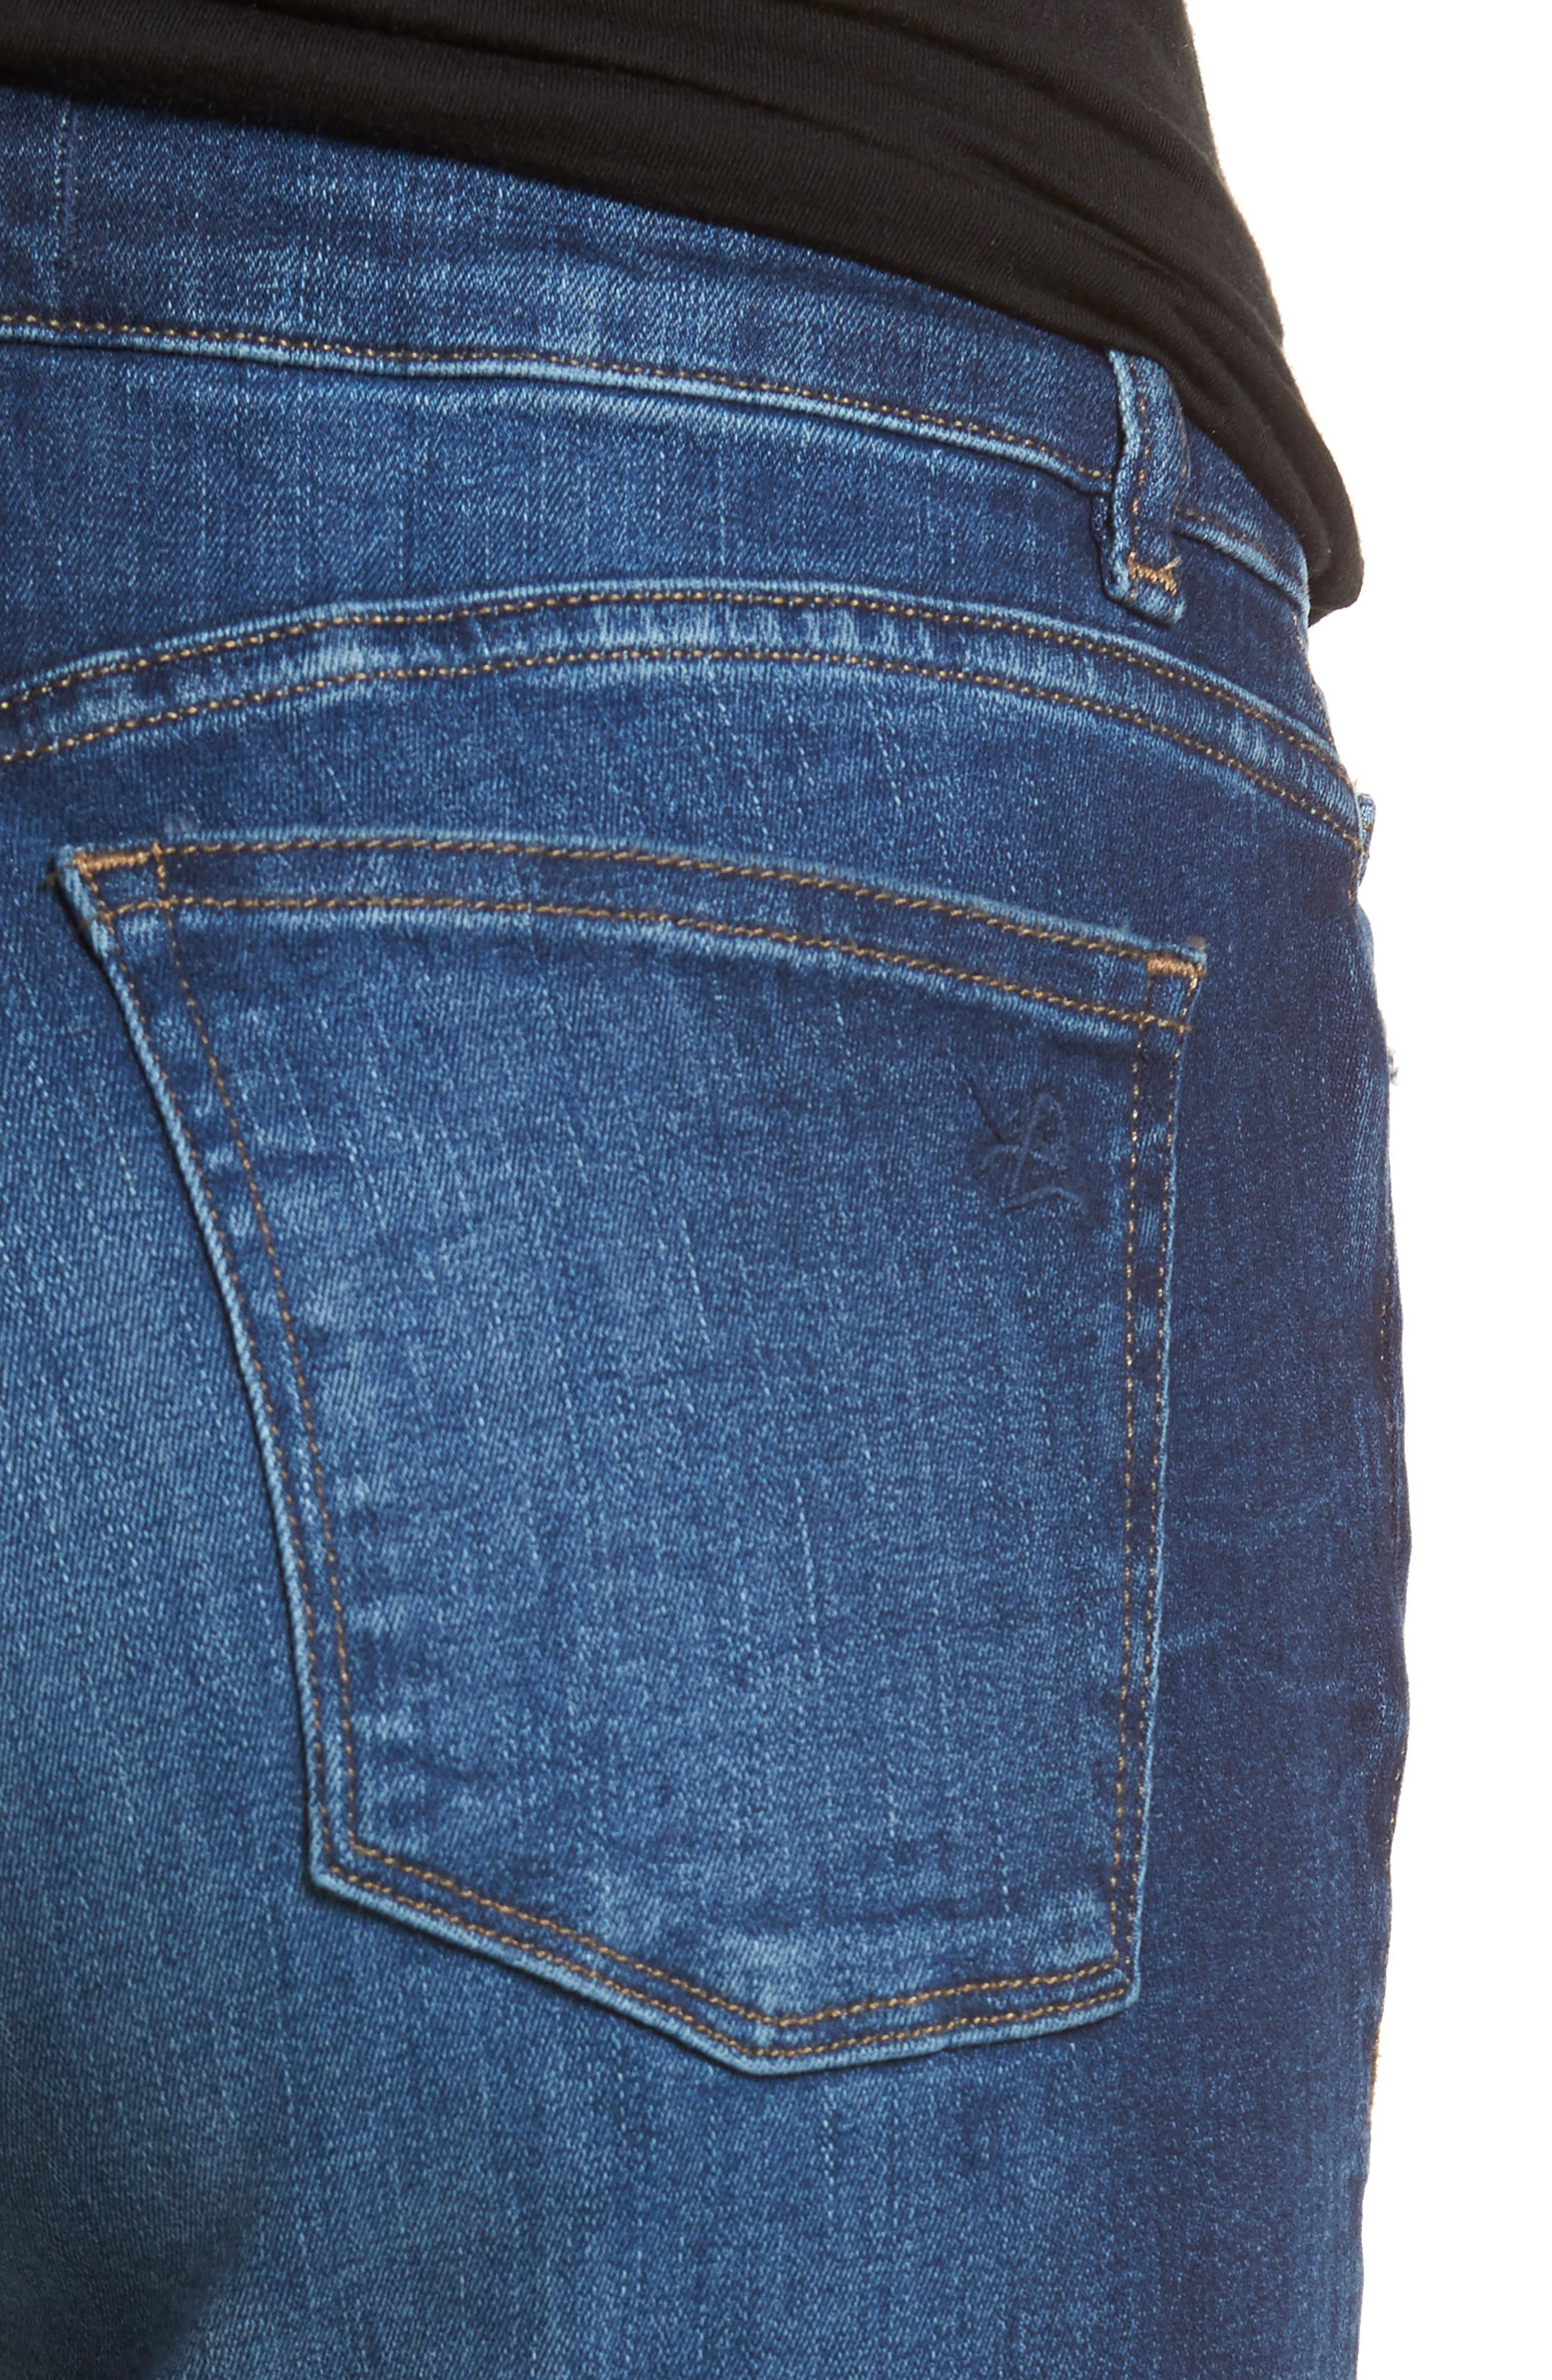 Coco Curvy Slim Straight Leg Jeans,                             Alternate thumbnail 4, color,